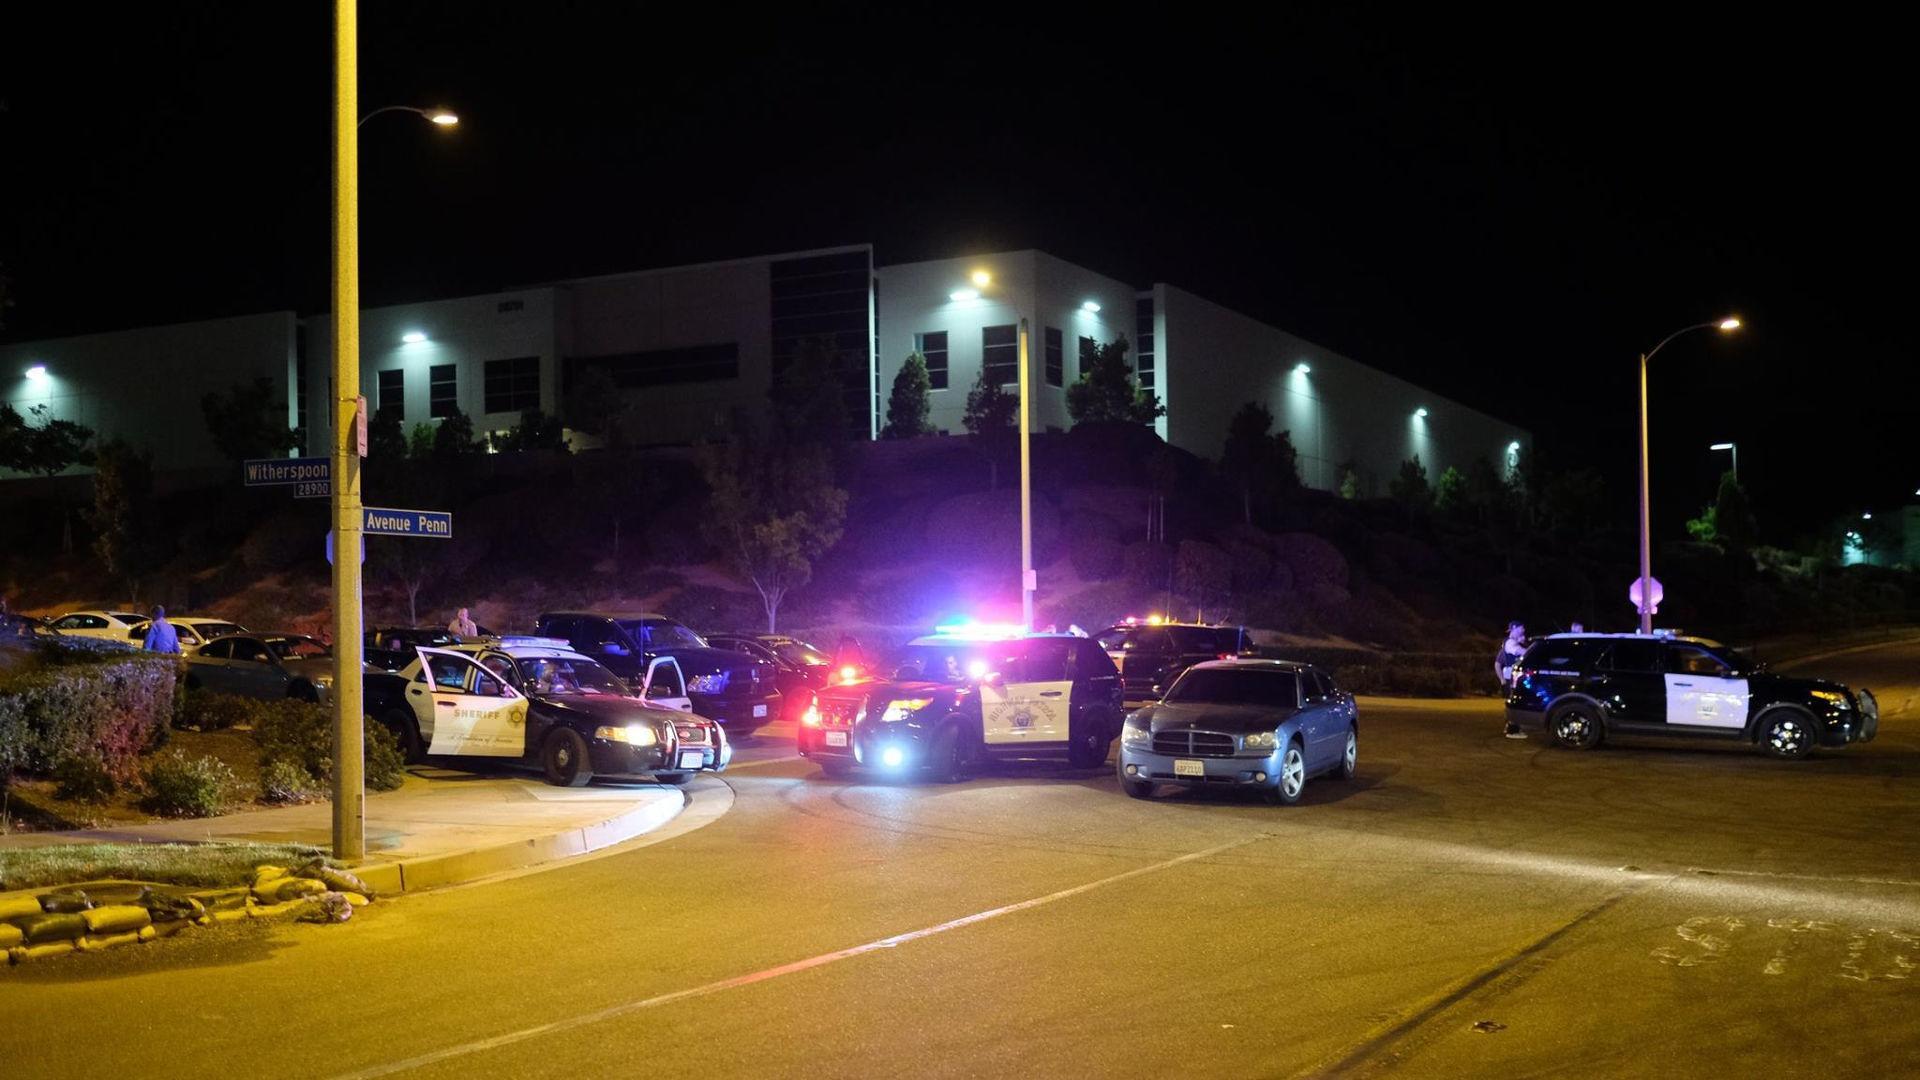 Atlanta Police Arrest 44 Impound 29 Cars In Huge Street Racing Bust